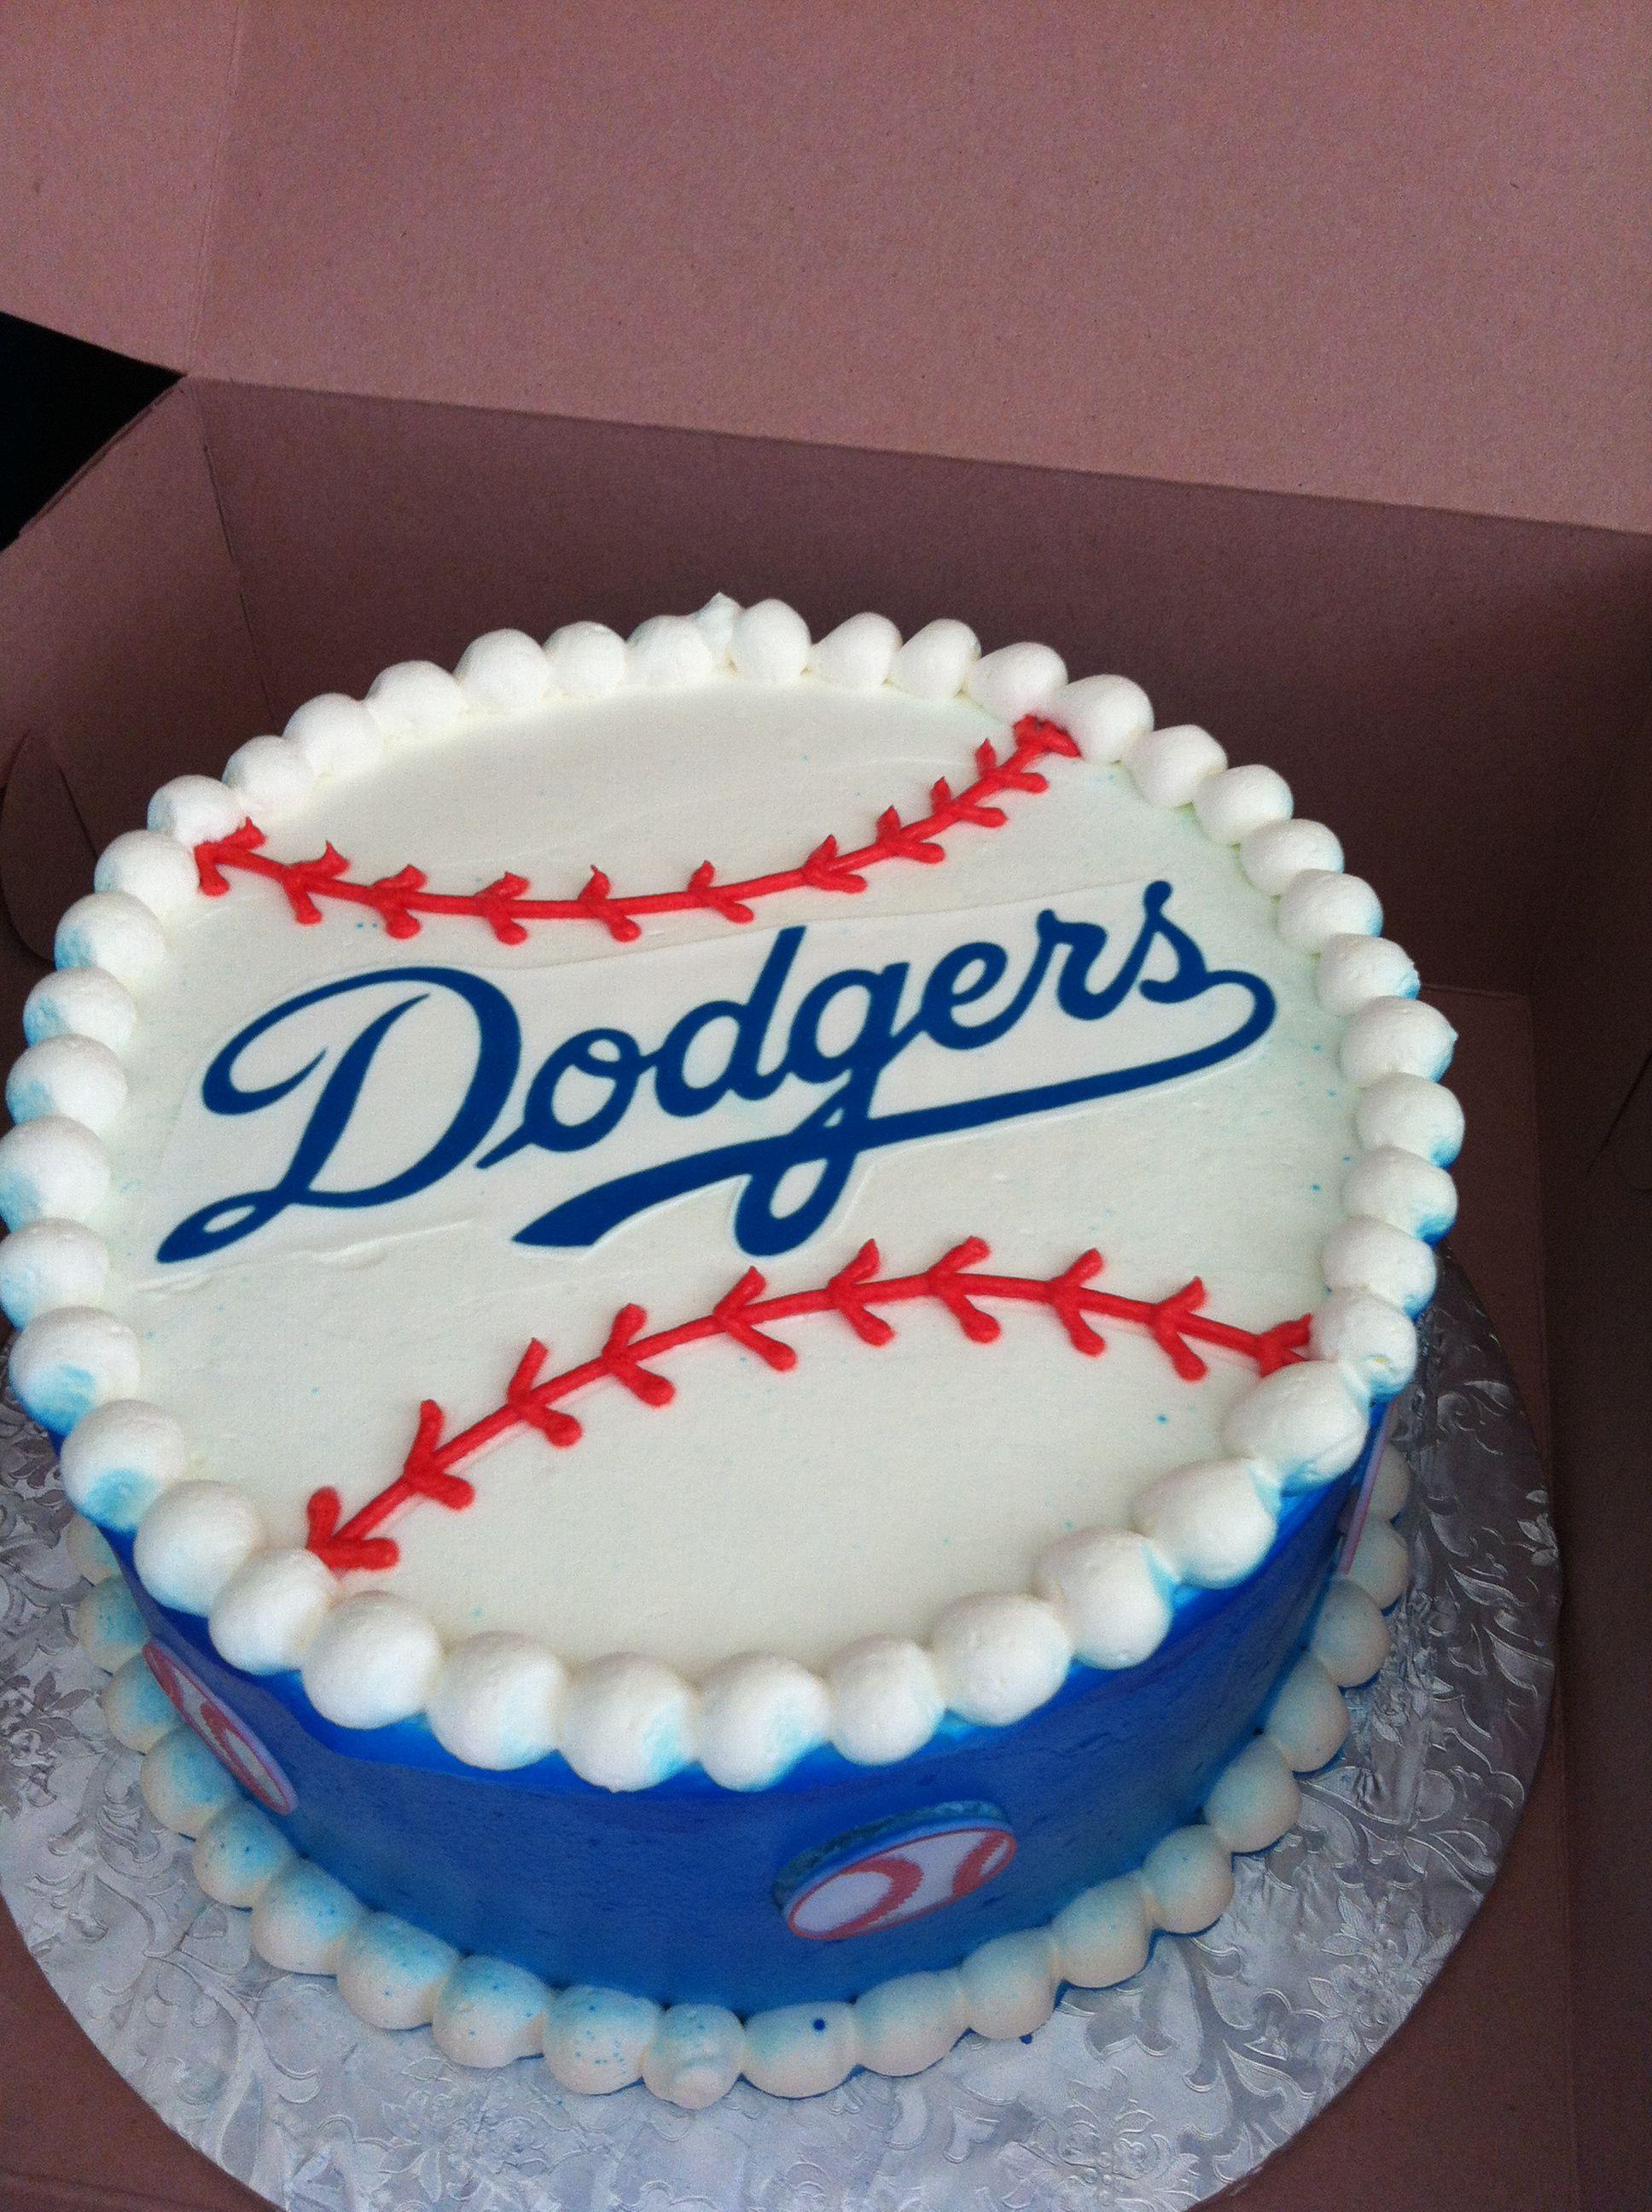 Stupendous Dodger Cake Dodgers Cake Dodgers Birthday Party Cupcake Cakes Funny Birthday Cards Online Benoljebrpdamsfinfo